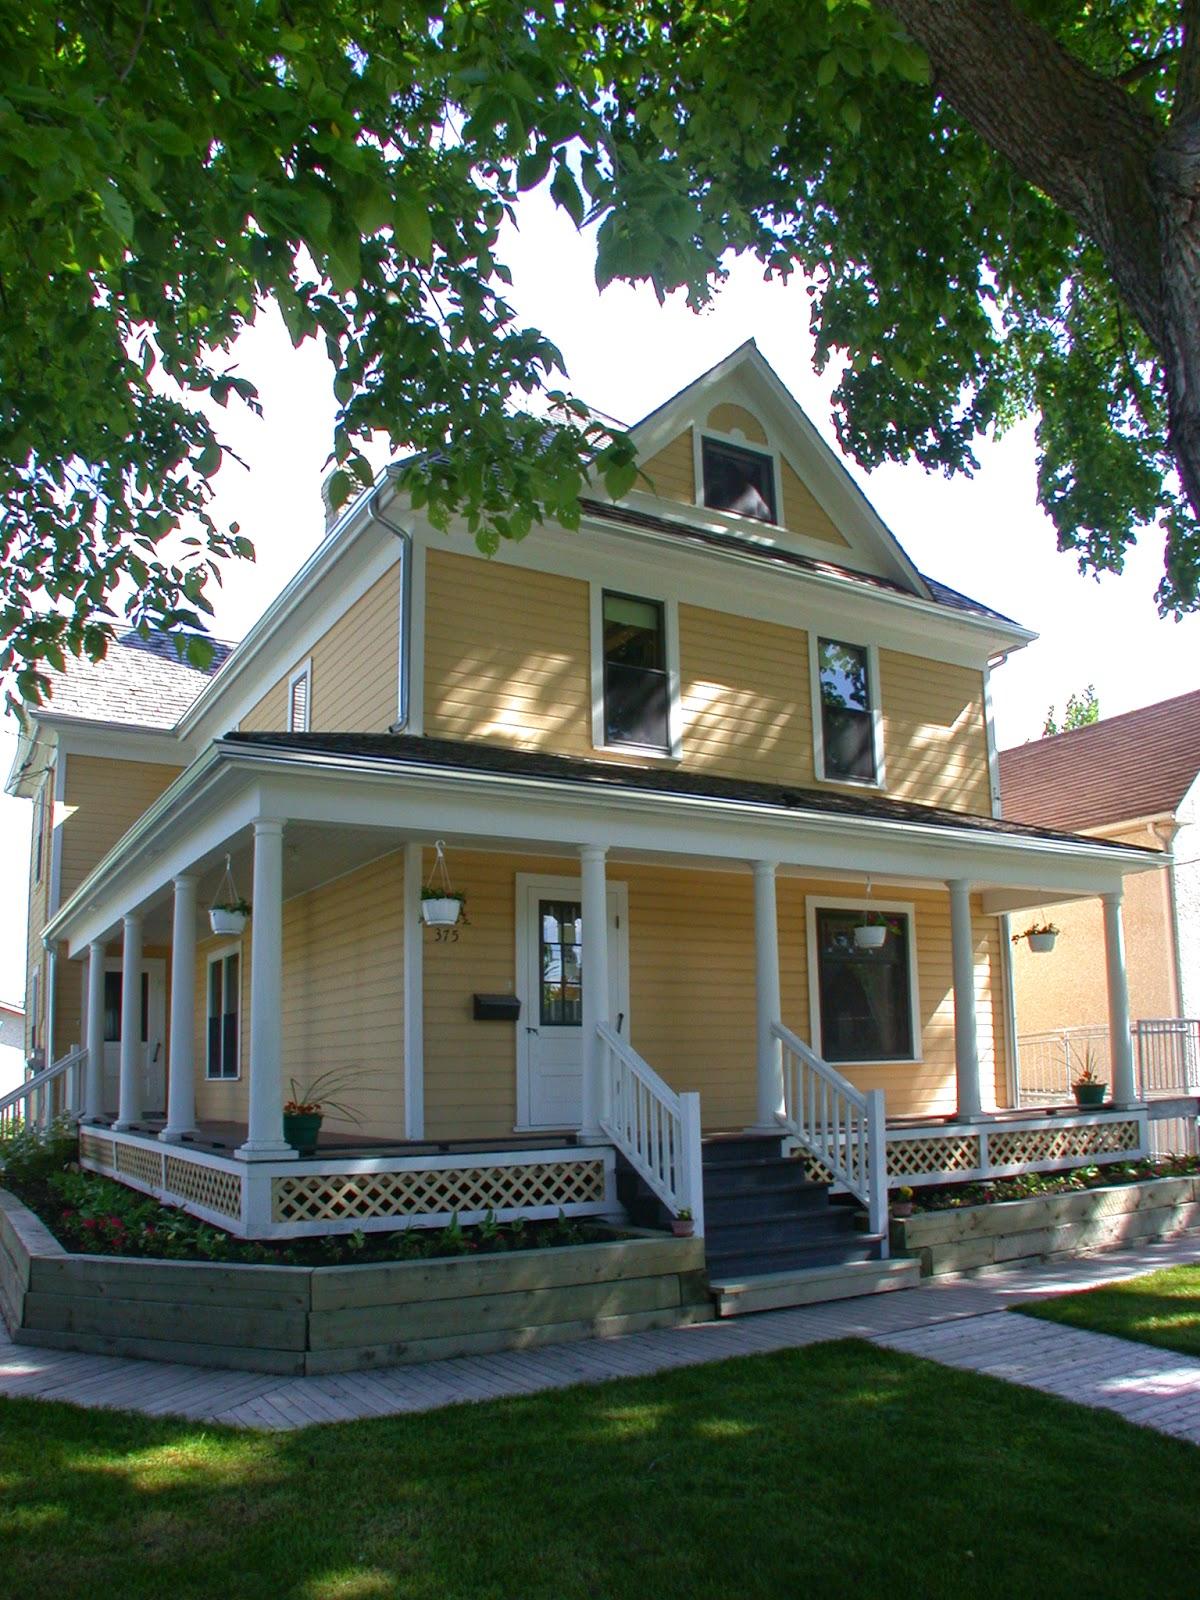 La Maison Gabrielle-Roy - 375 rue Deschambault